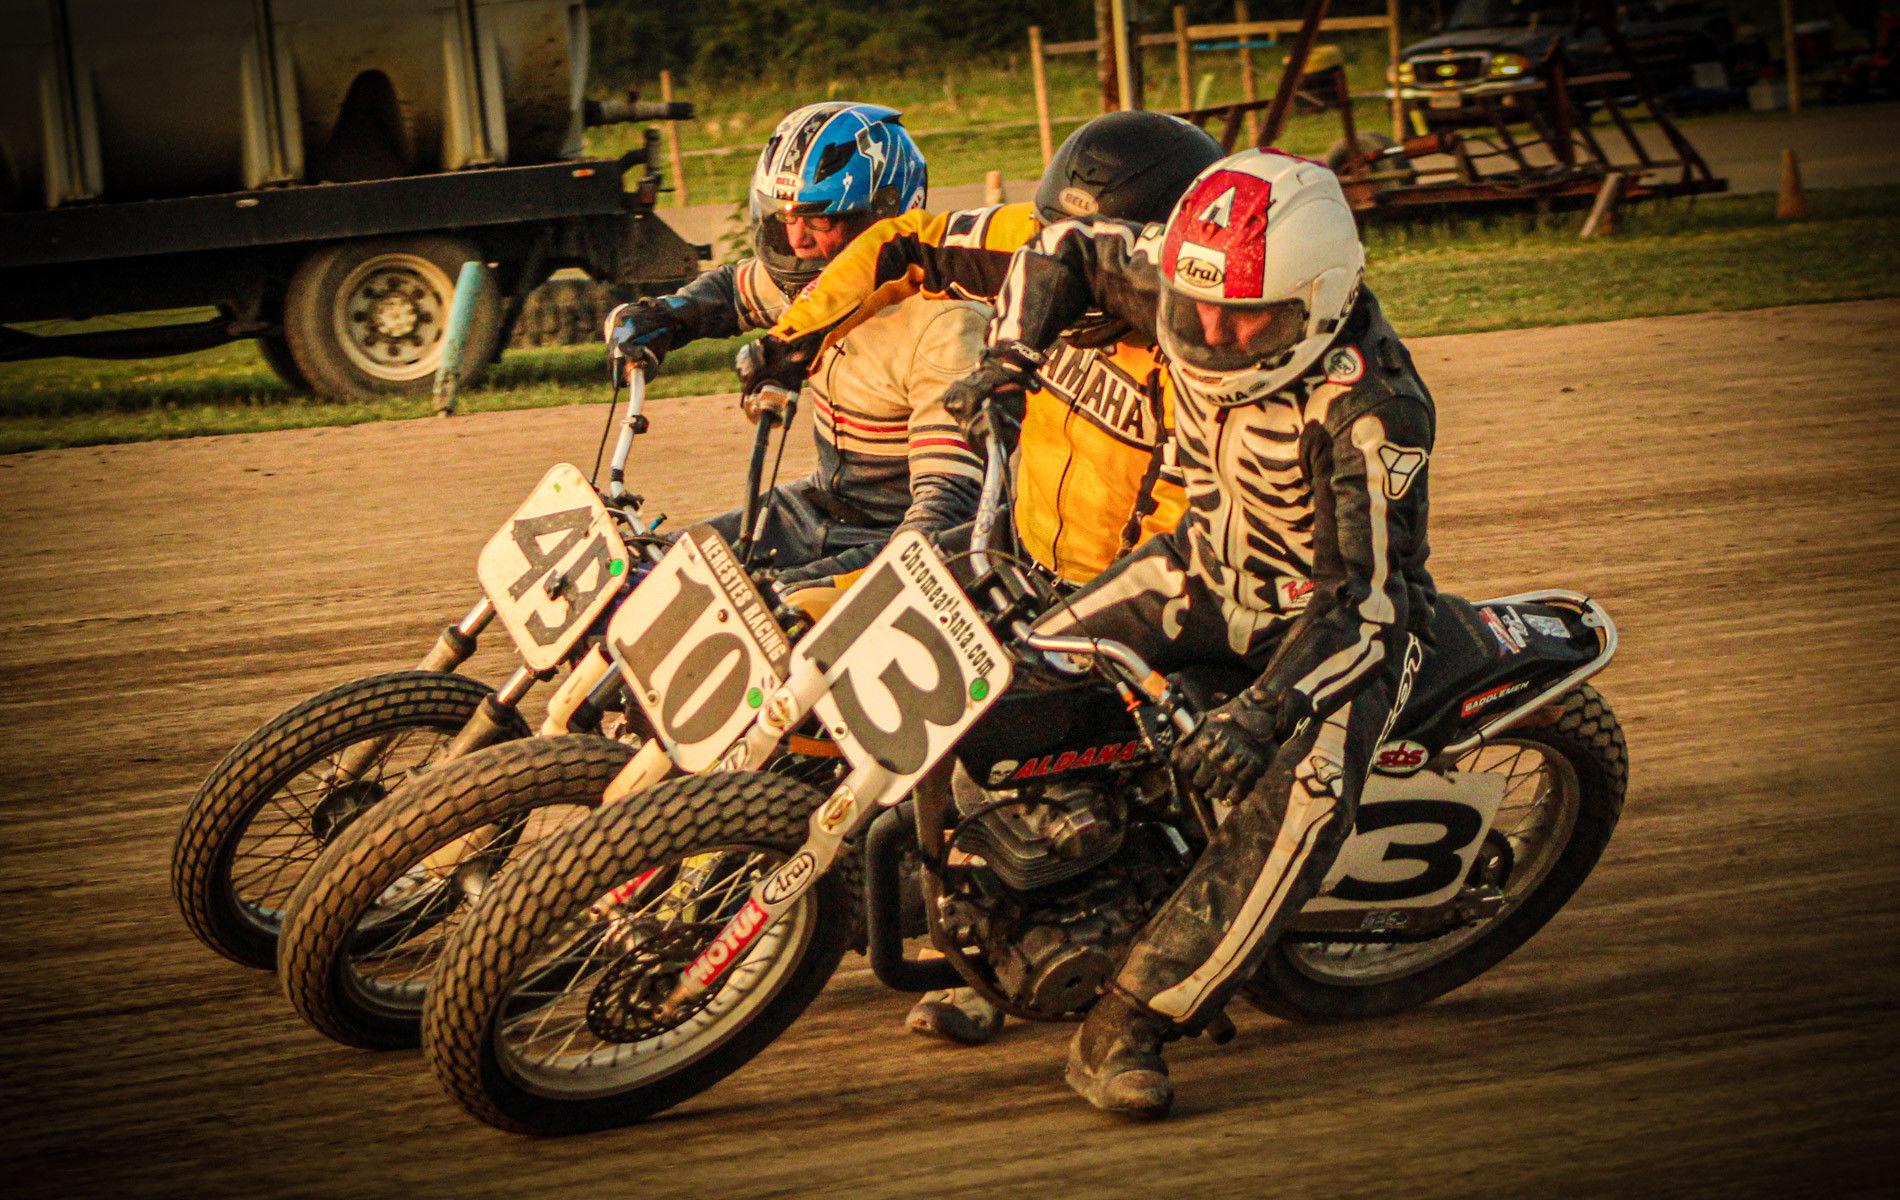 David Aldana (13) and others at an AHRMA vintage dirt track event. Photo courtesy AHRMA.